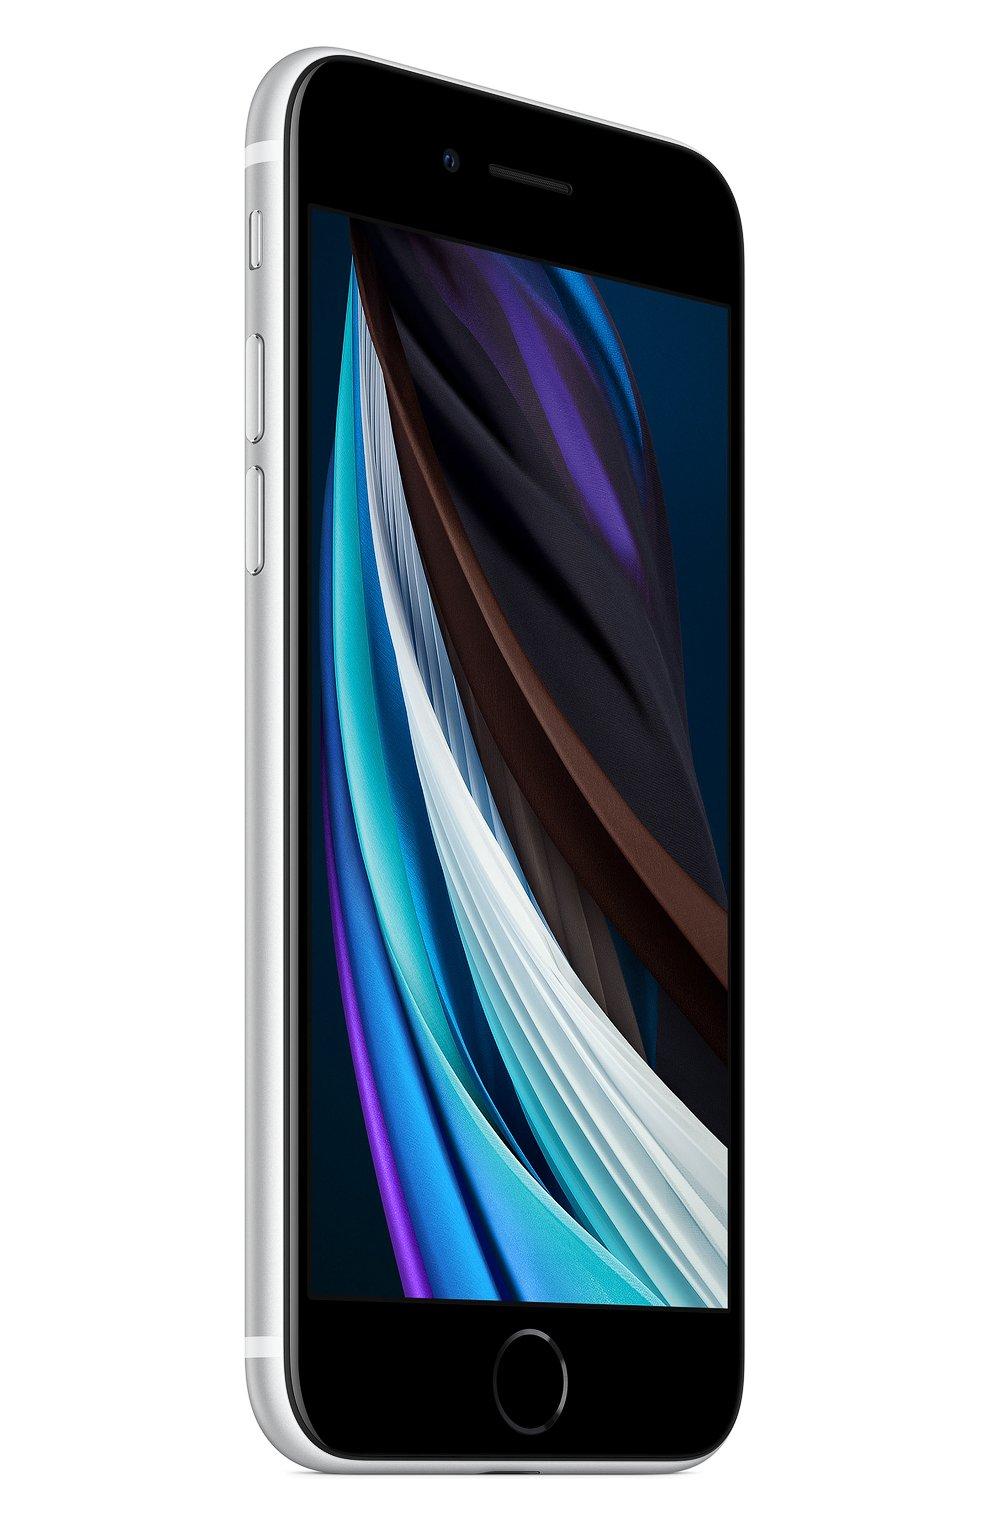 Мужской iphone se (2020) 128gb white APPLE  white цвета, арт. MXD12RU/A | Фото 3